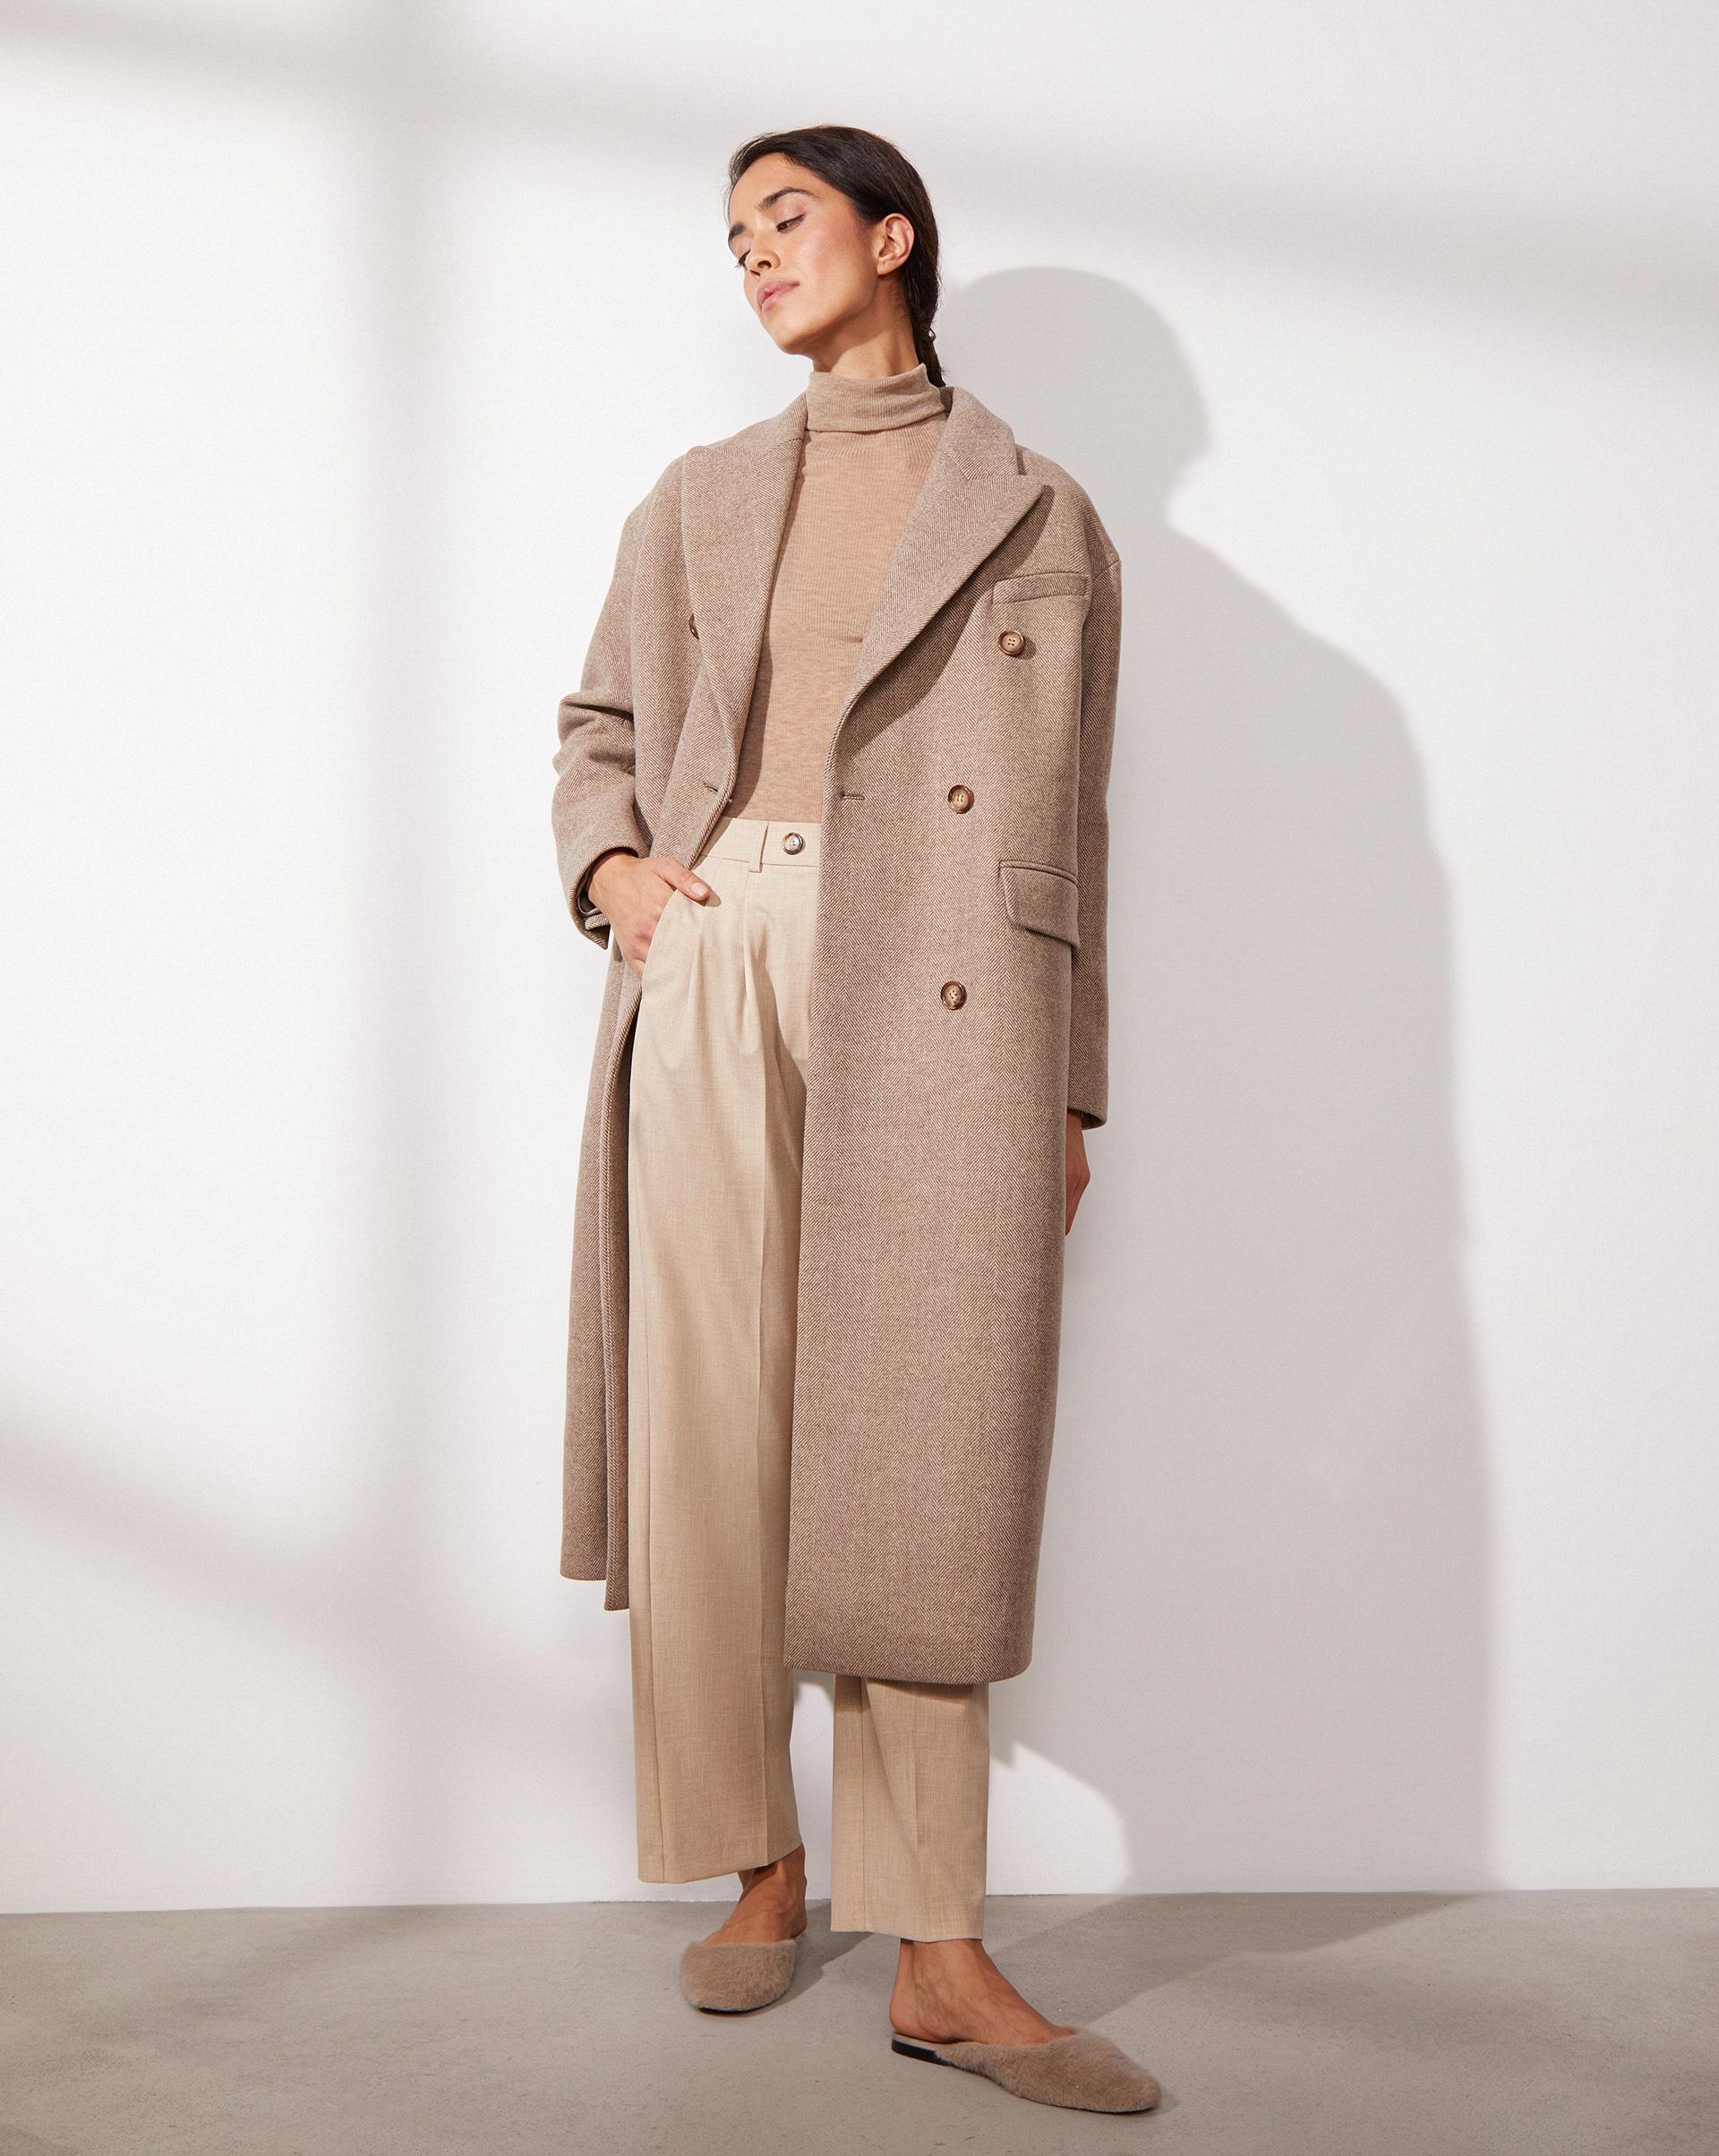 12⠀STOREEZ Прямое двубортное пальто 105717 фото